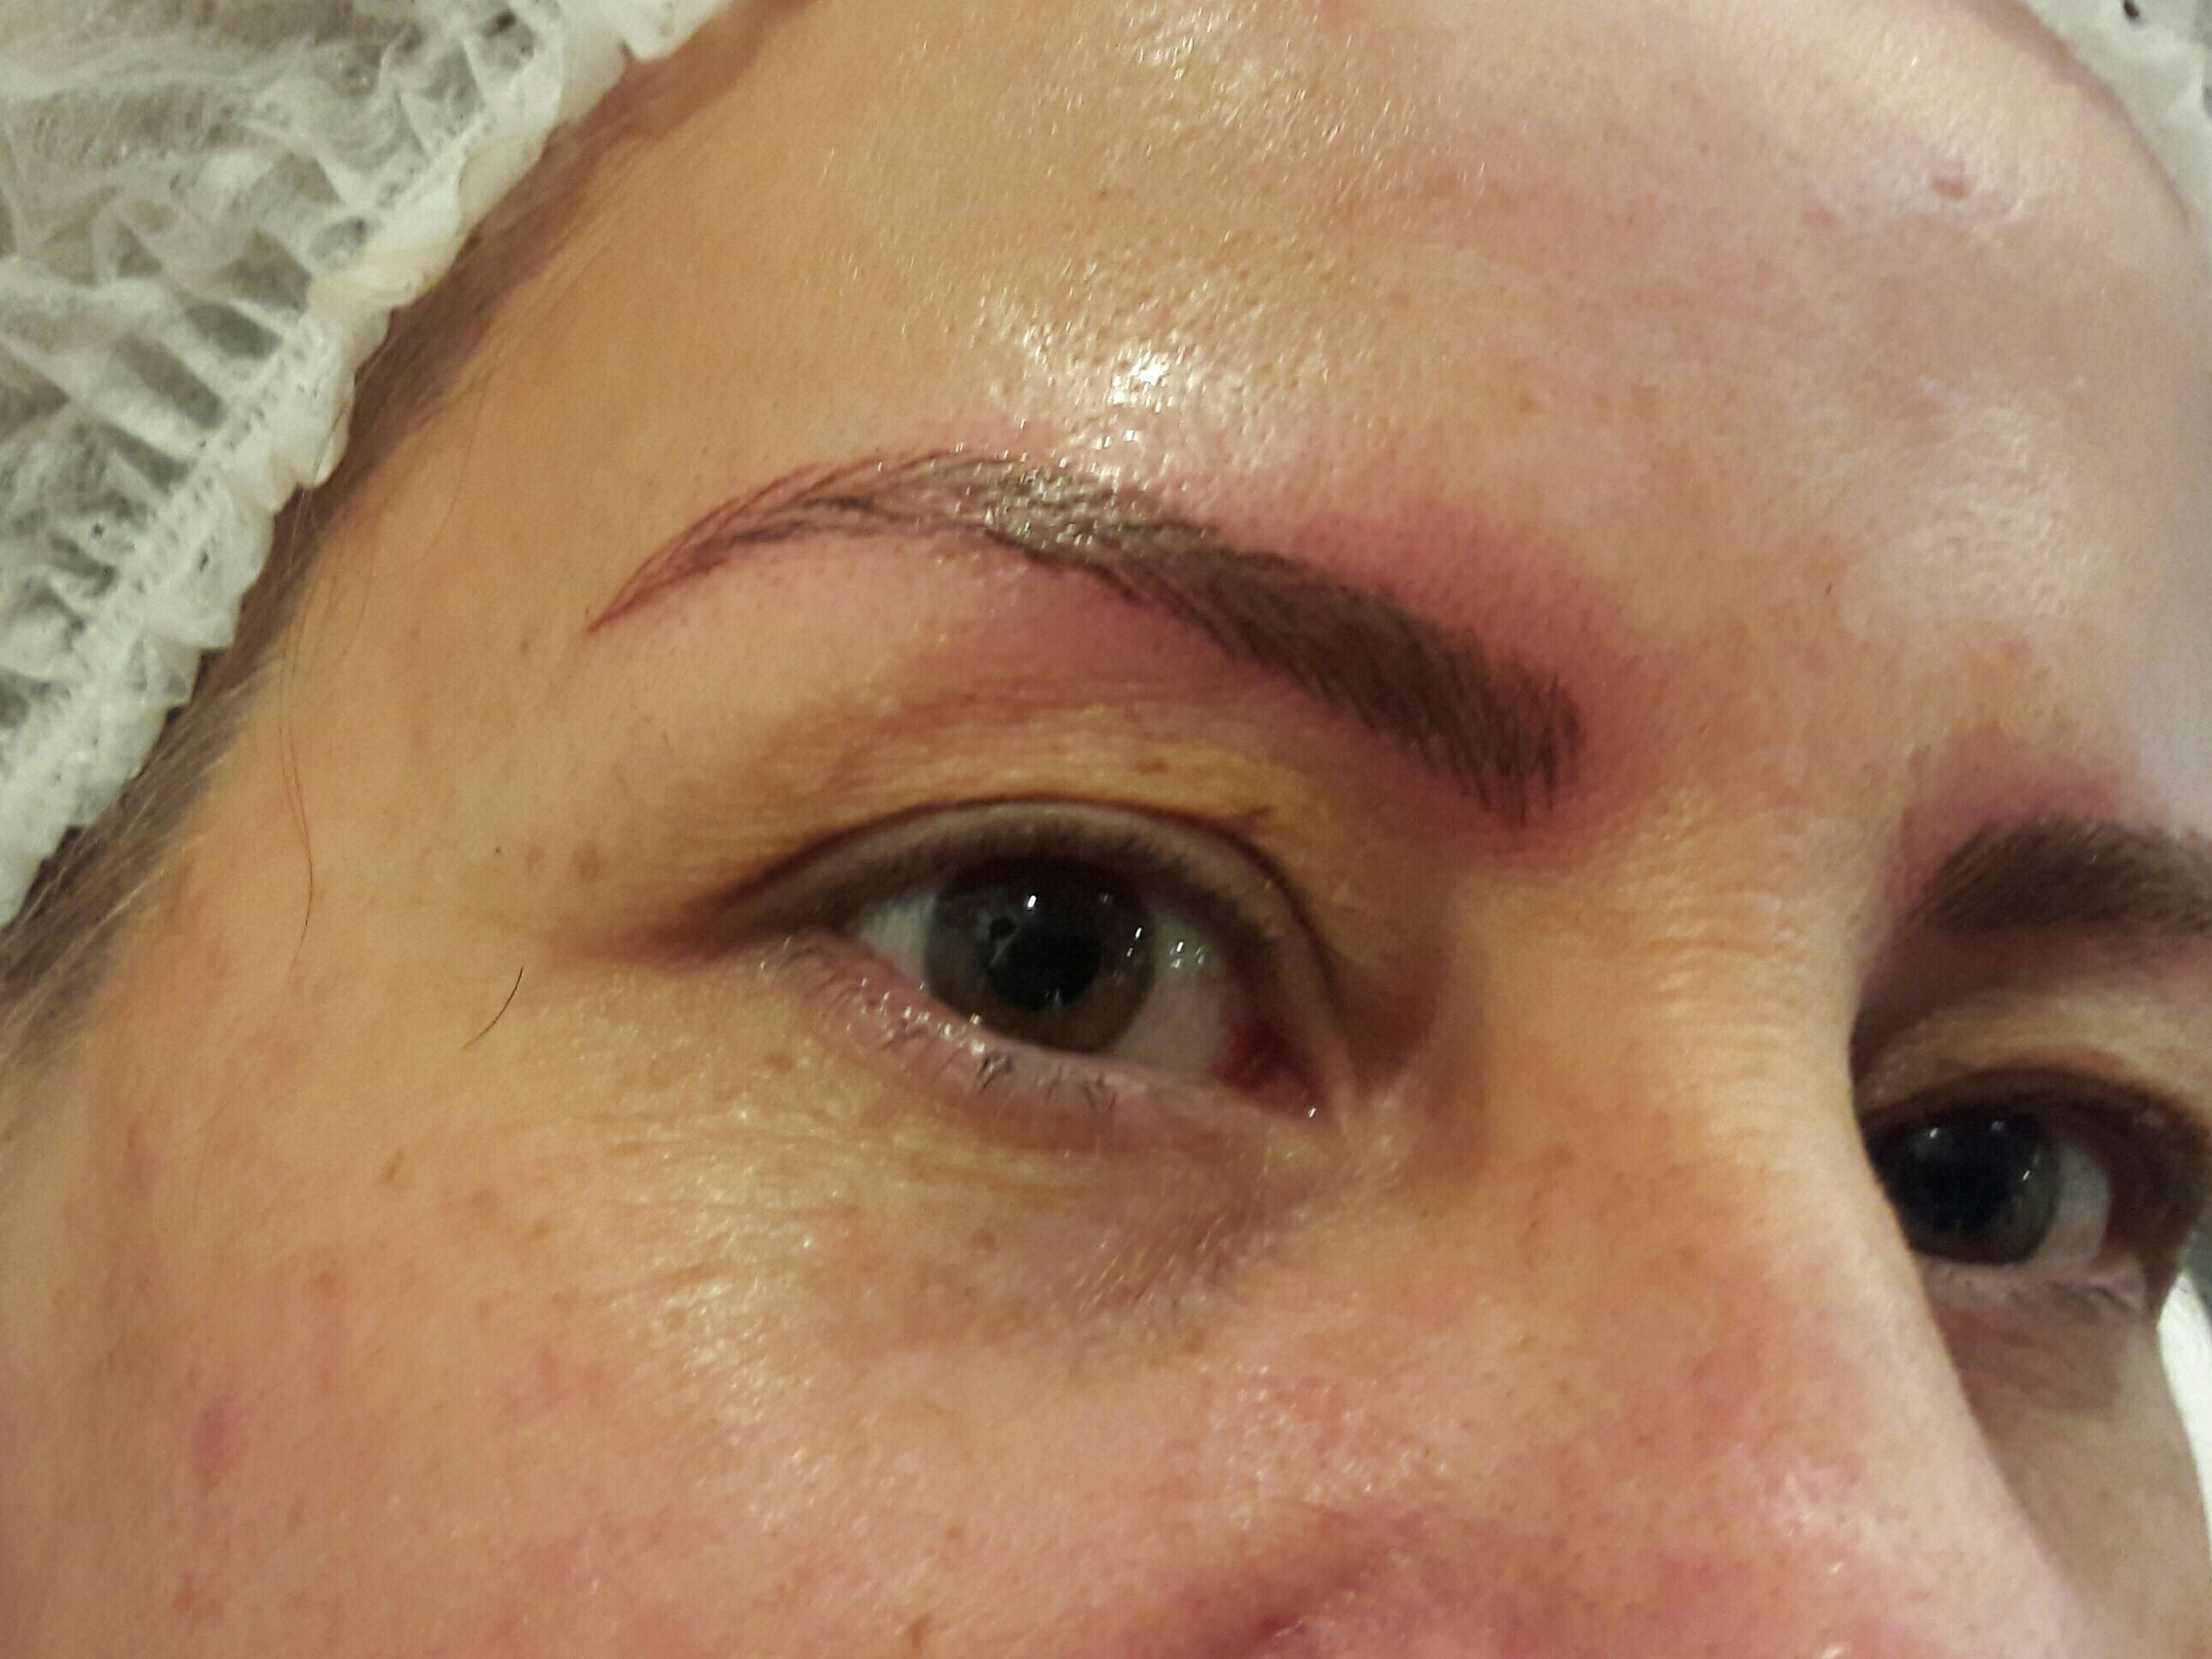 Microblading estética micropigmentador(a) depilador(a) designer de sobrancelhas esteticista outros micropigmentador(a) dermopigmentador(a) maquiador(a)